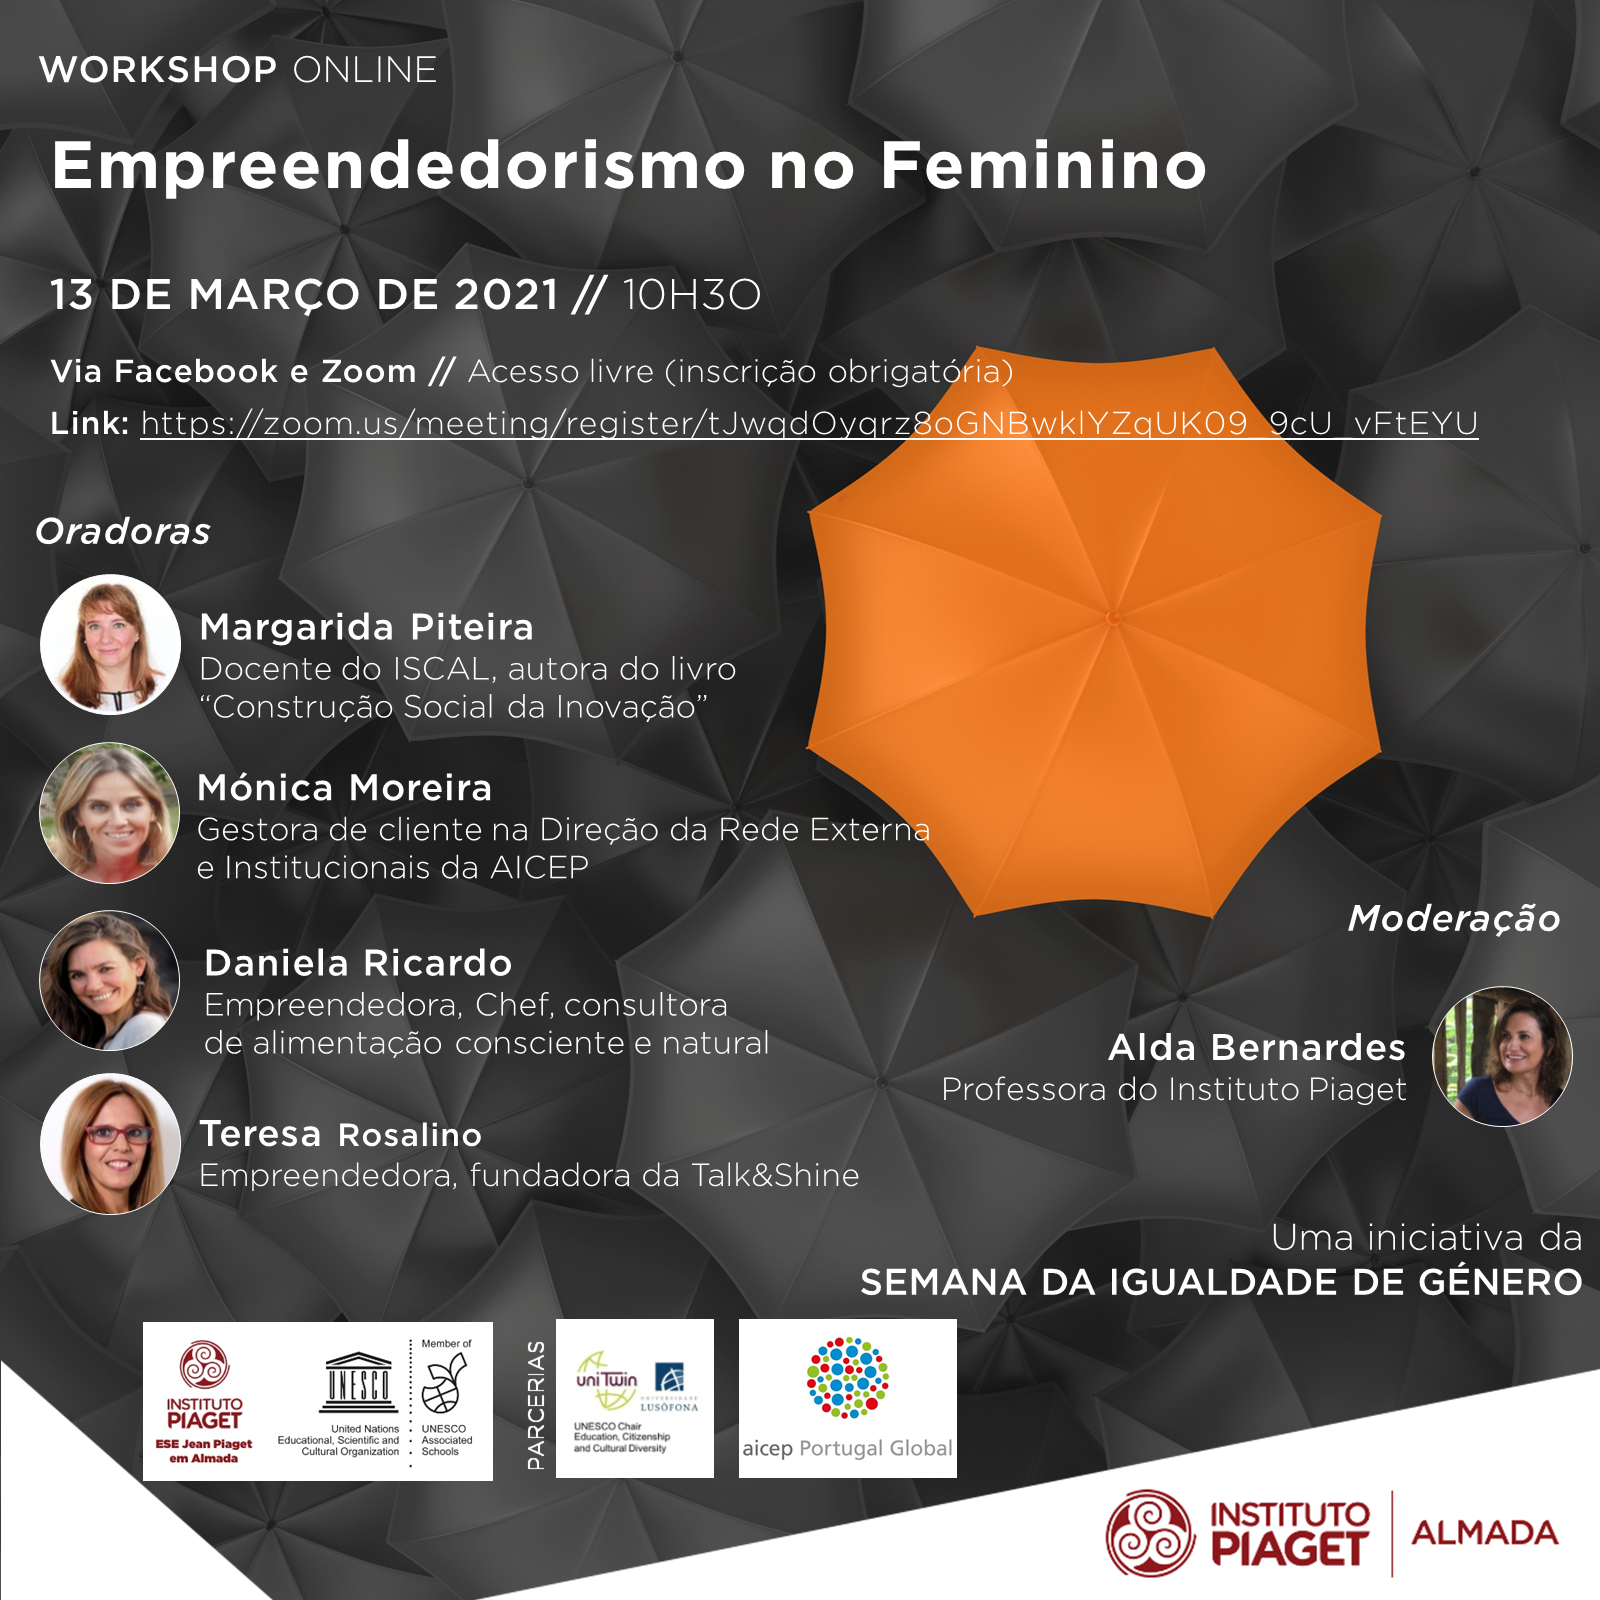 Empreendedorismo no Feminino